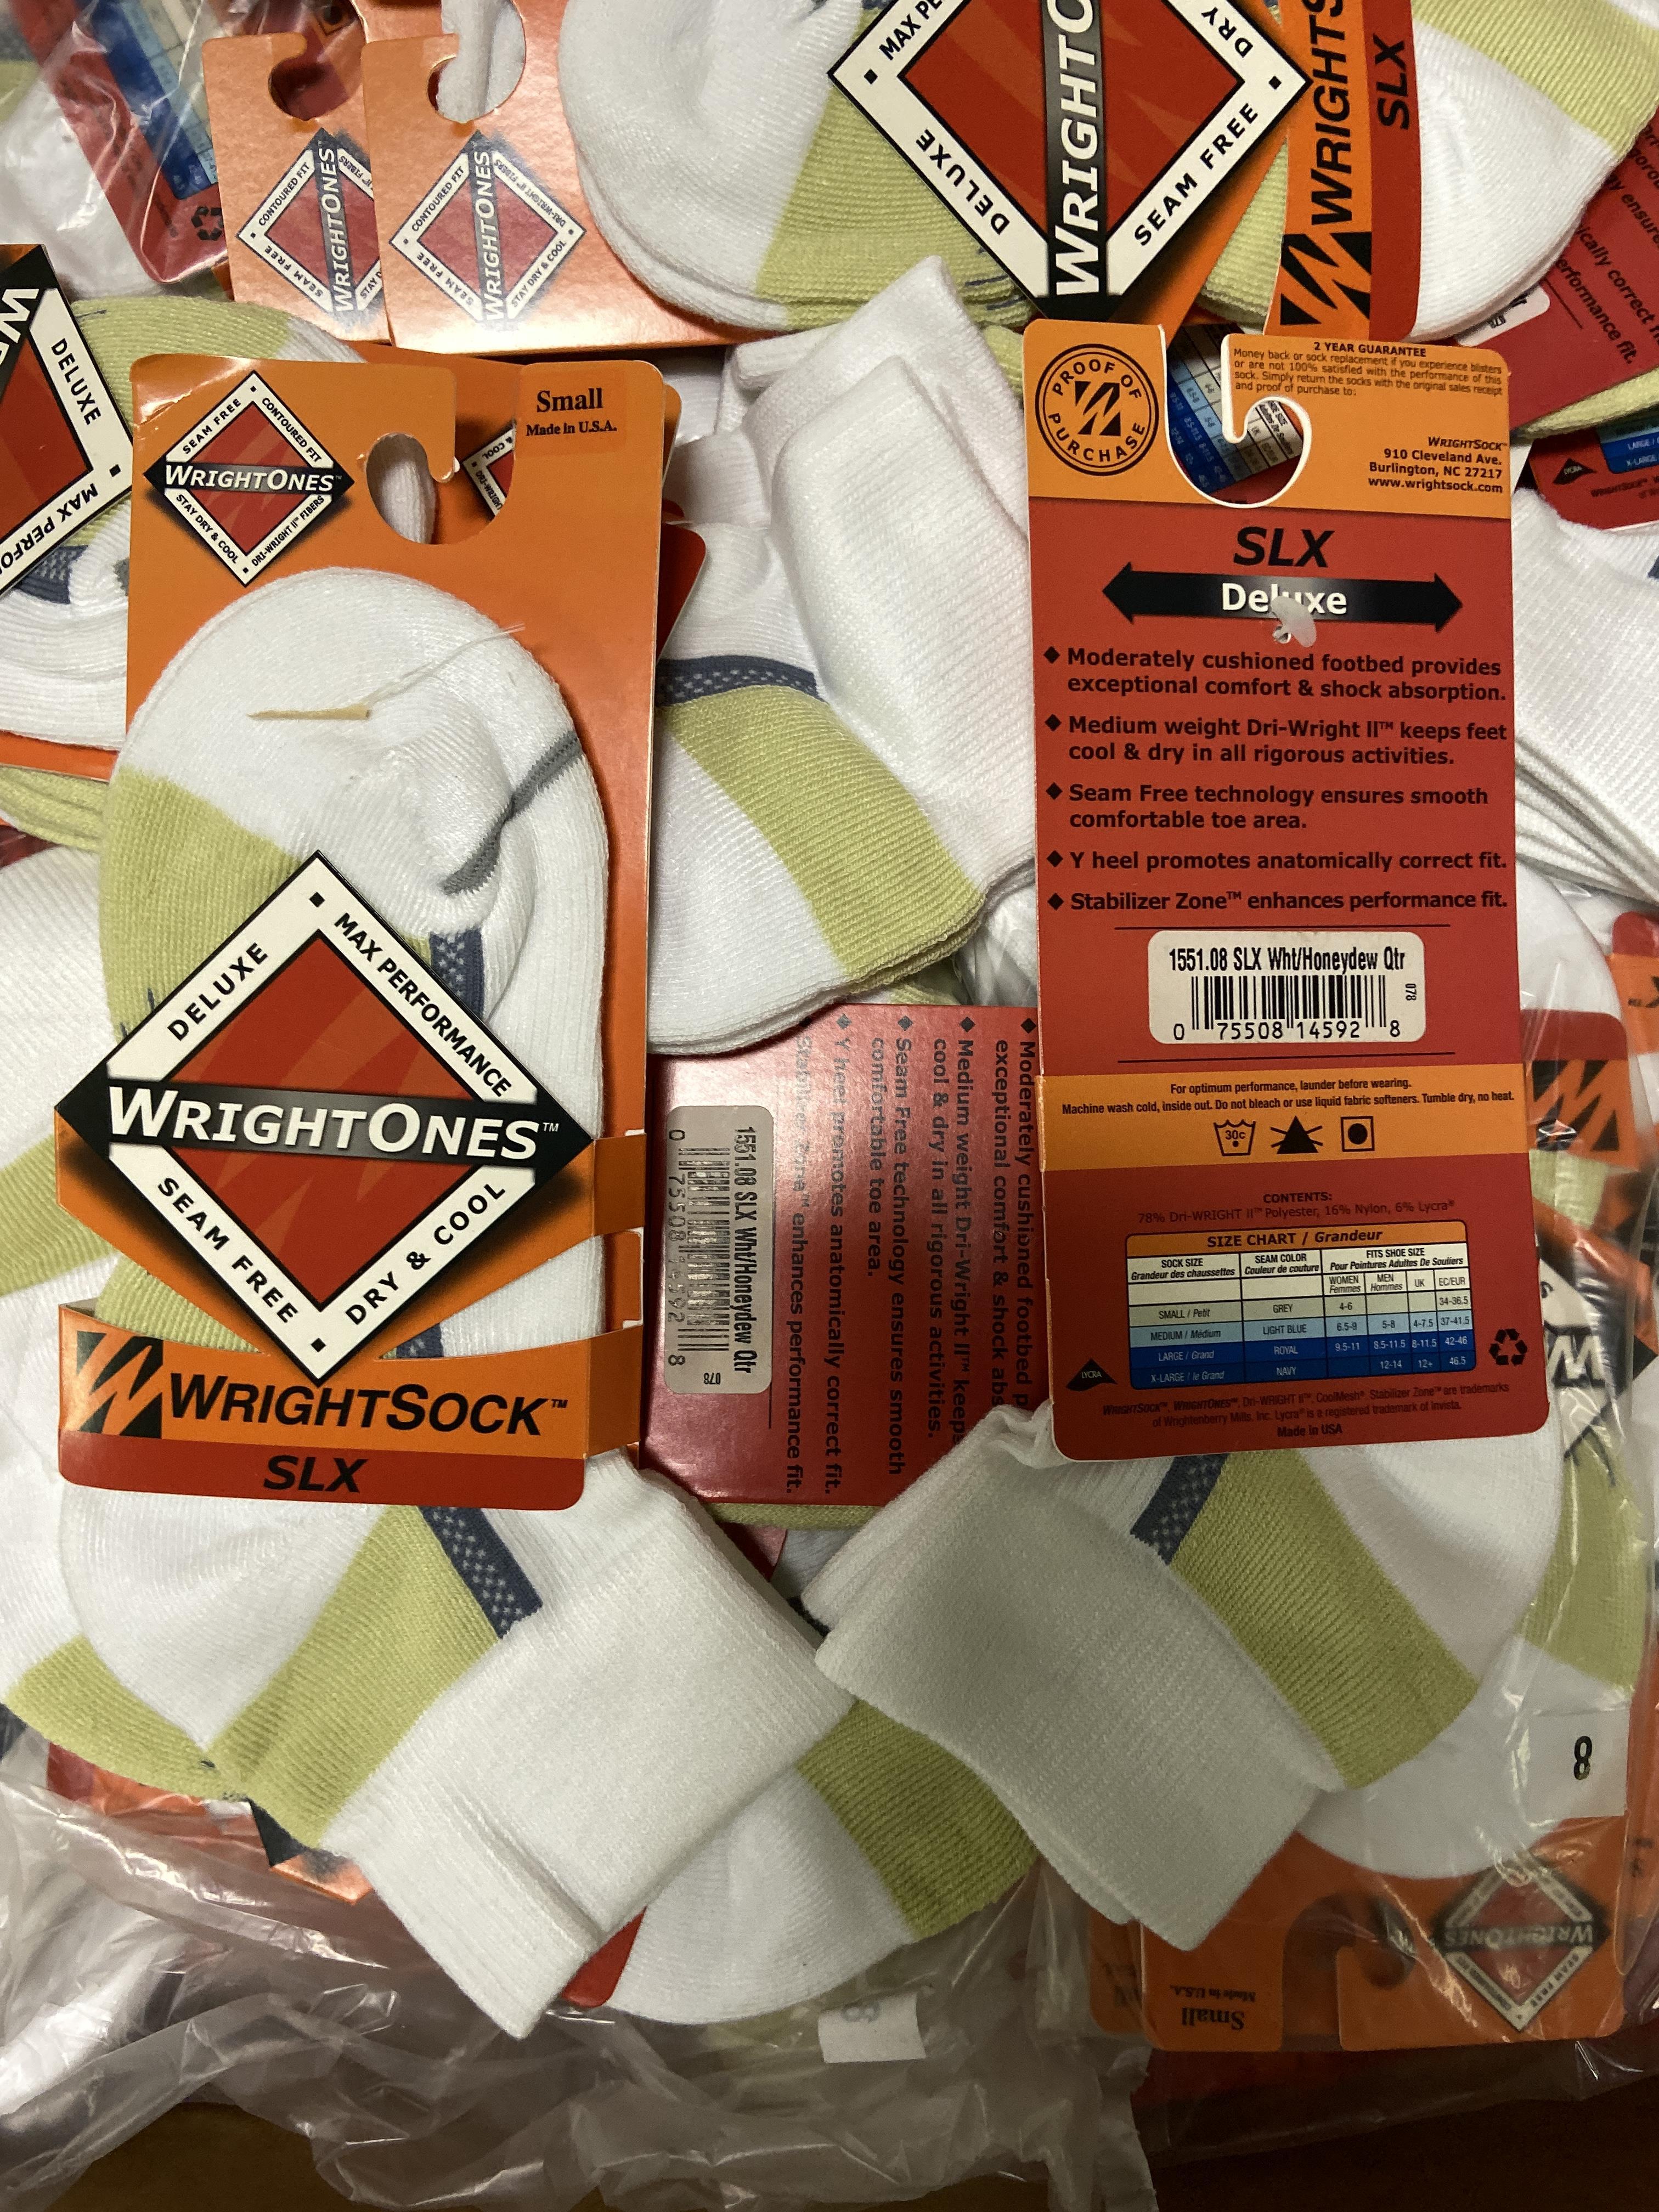 500+ packs of New Socks, Wrightsocks Coolmesh and WrightOnes SLX, Various White Styles - Image 6 of 6